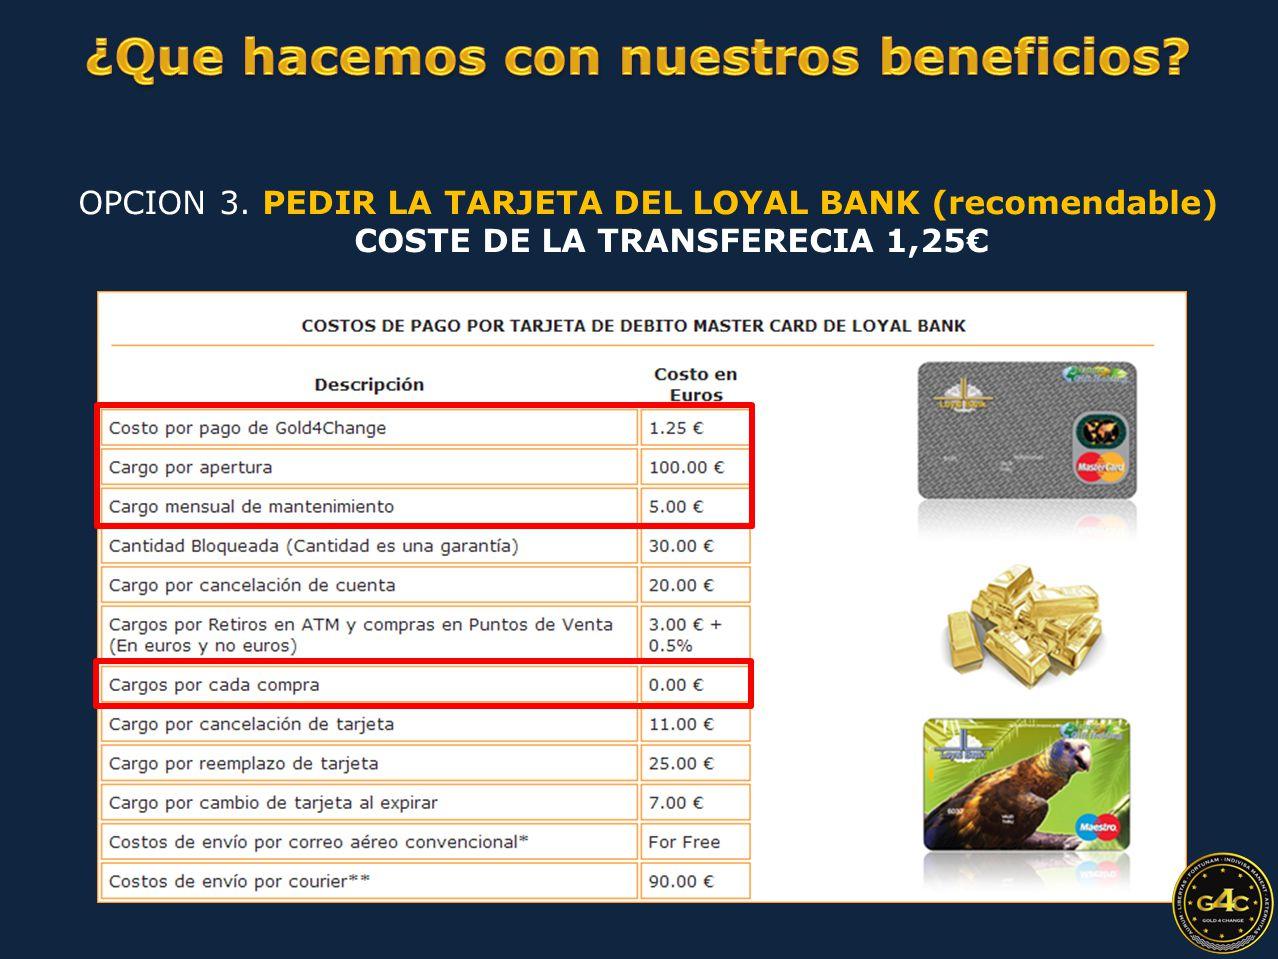 OPCION 3. PEDIR LA TARJETA DEL LOYAL BANK (recomendable) COSTE DE LA TRANSFERECIA 1,25€